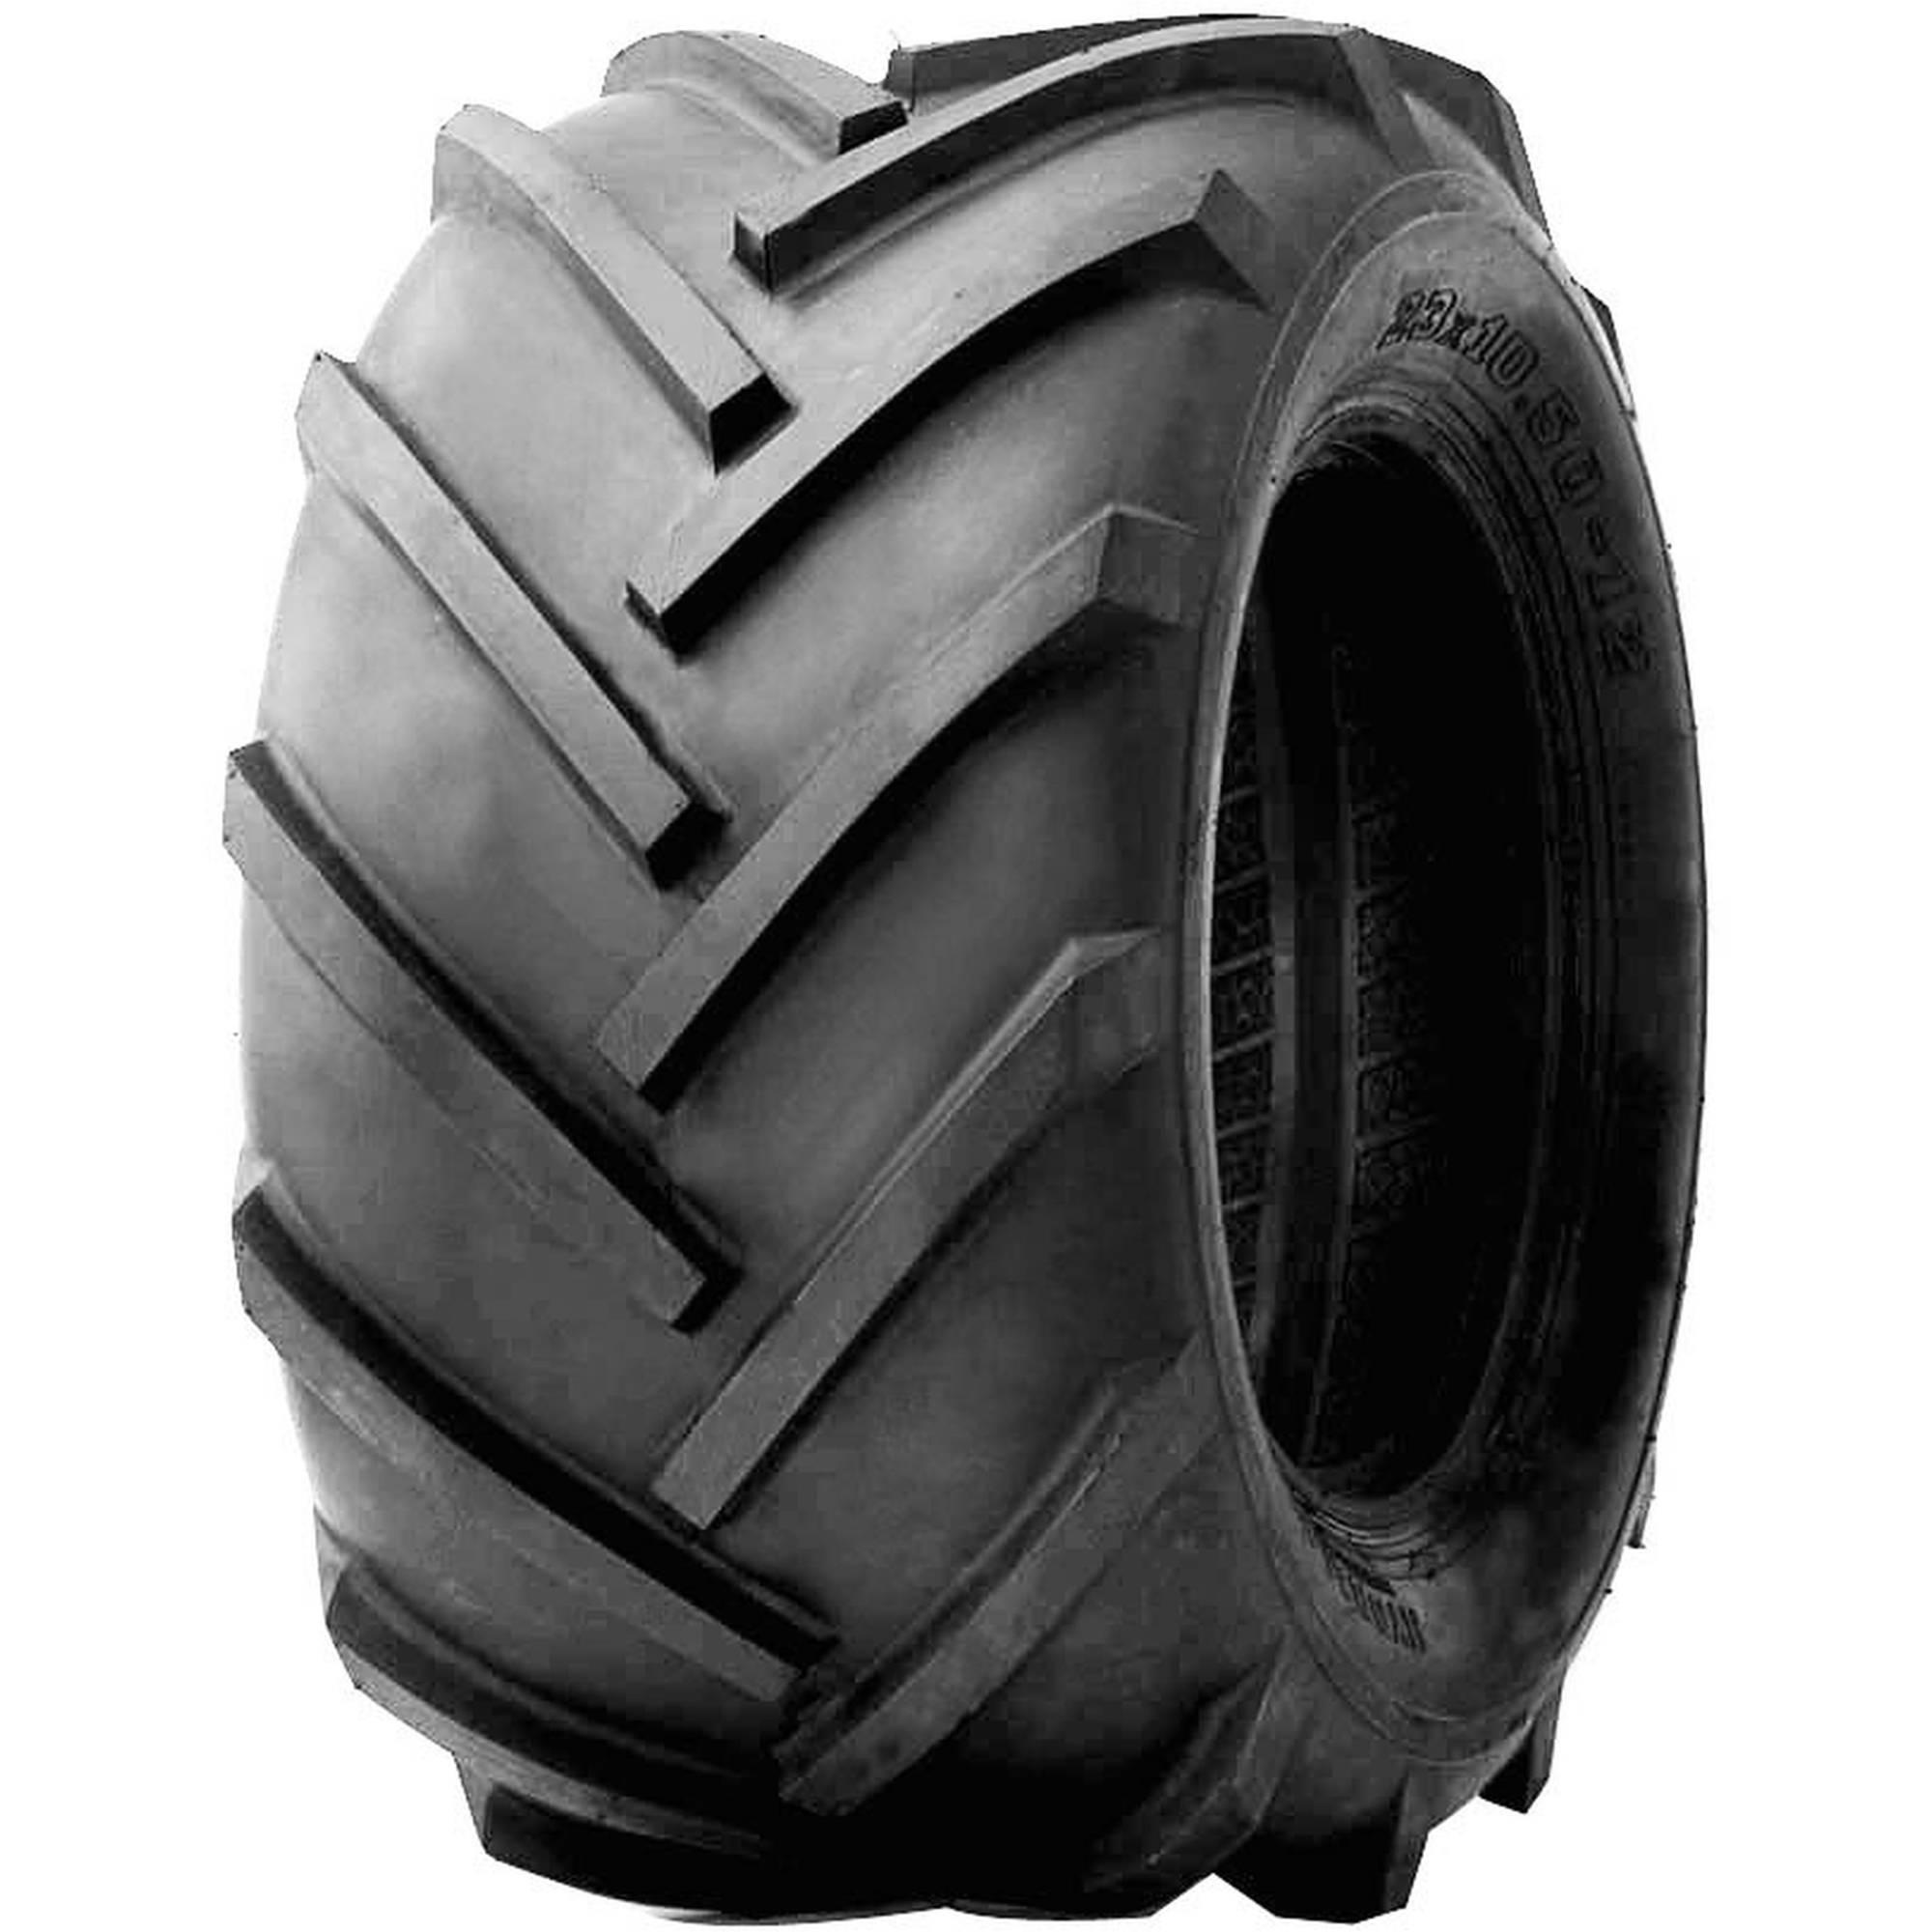 20X10-8 by Carlisle Carlisle Turf Saver Lawn /& Garden Tire